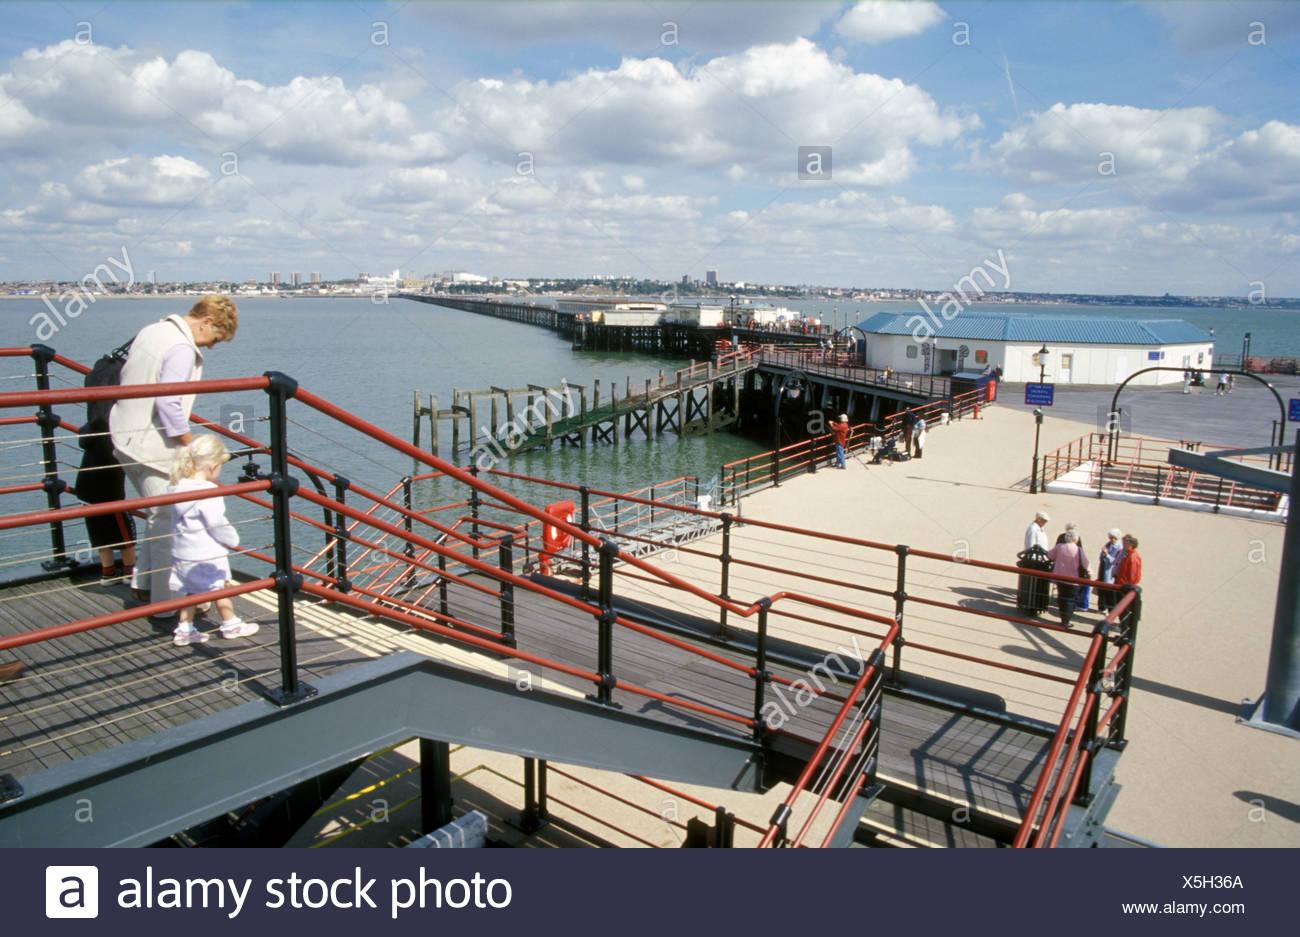 Pier Southend on Sea Essex UK Stock Photo